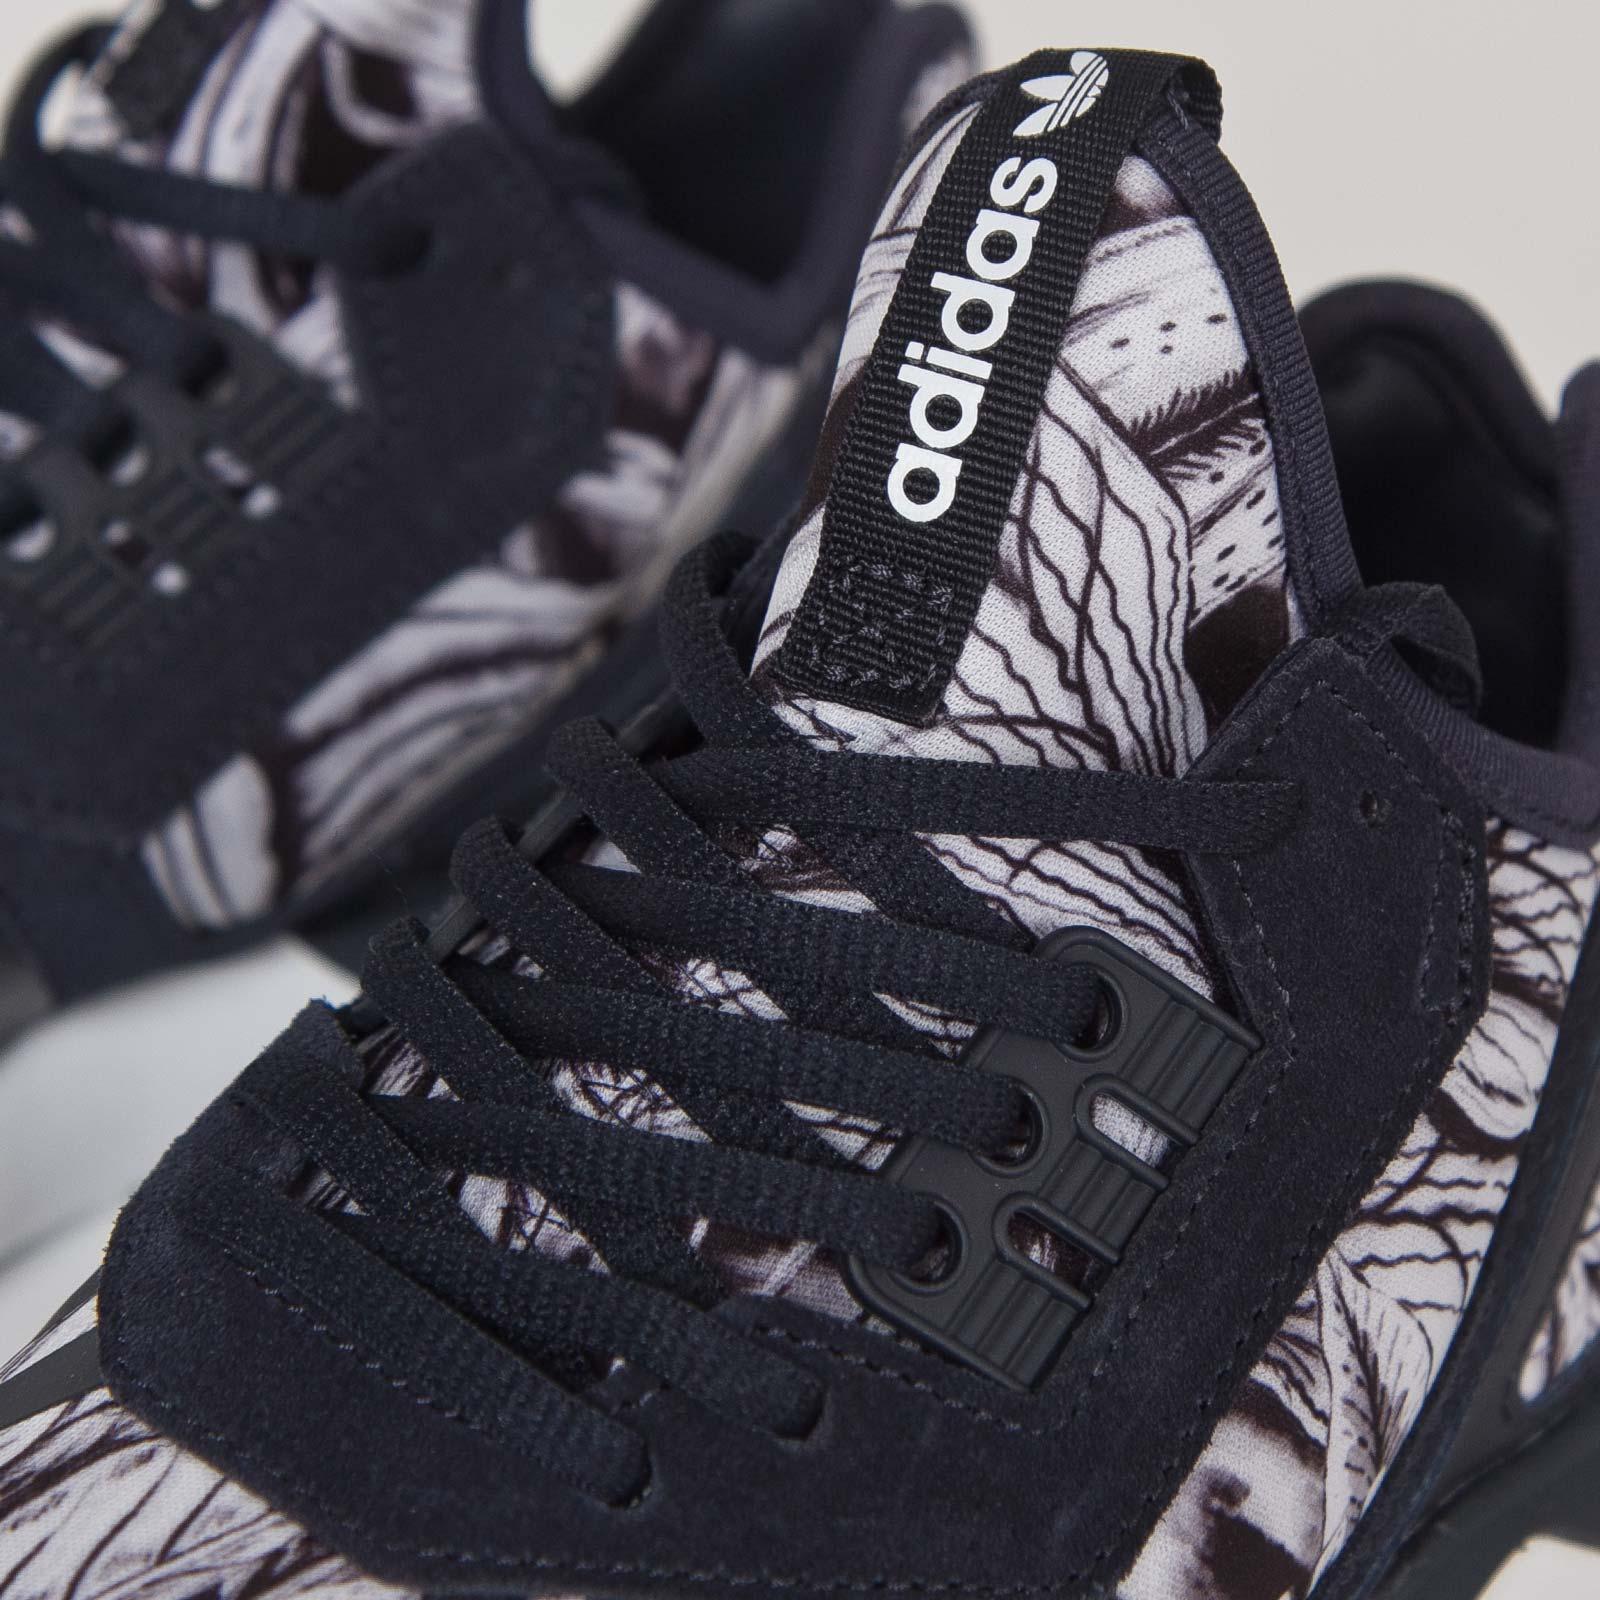 promo code 4cc07 006d9 adidas Tubular Runner W - 6. Close